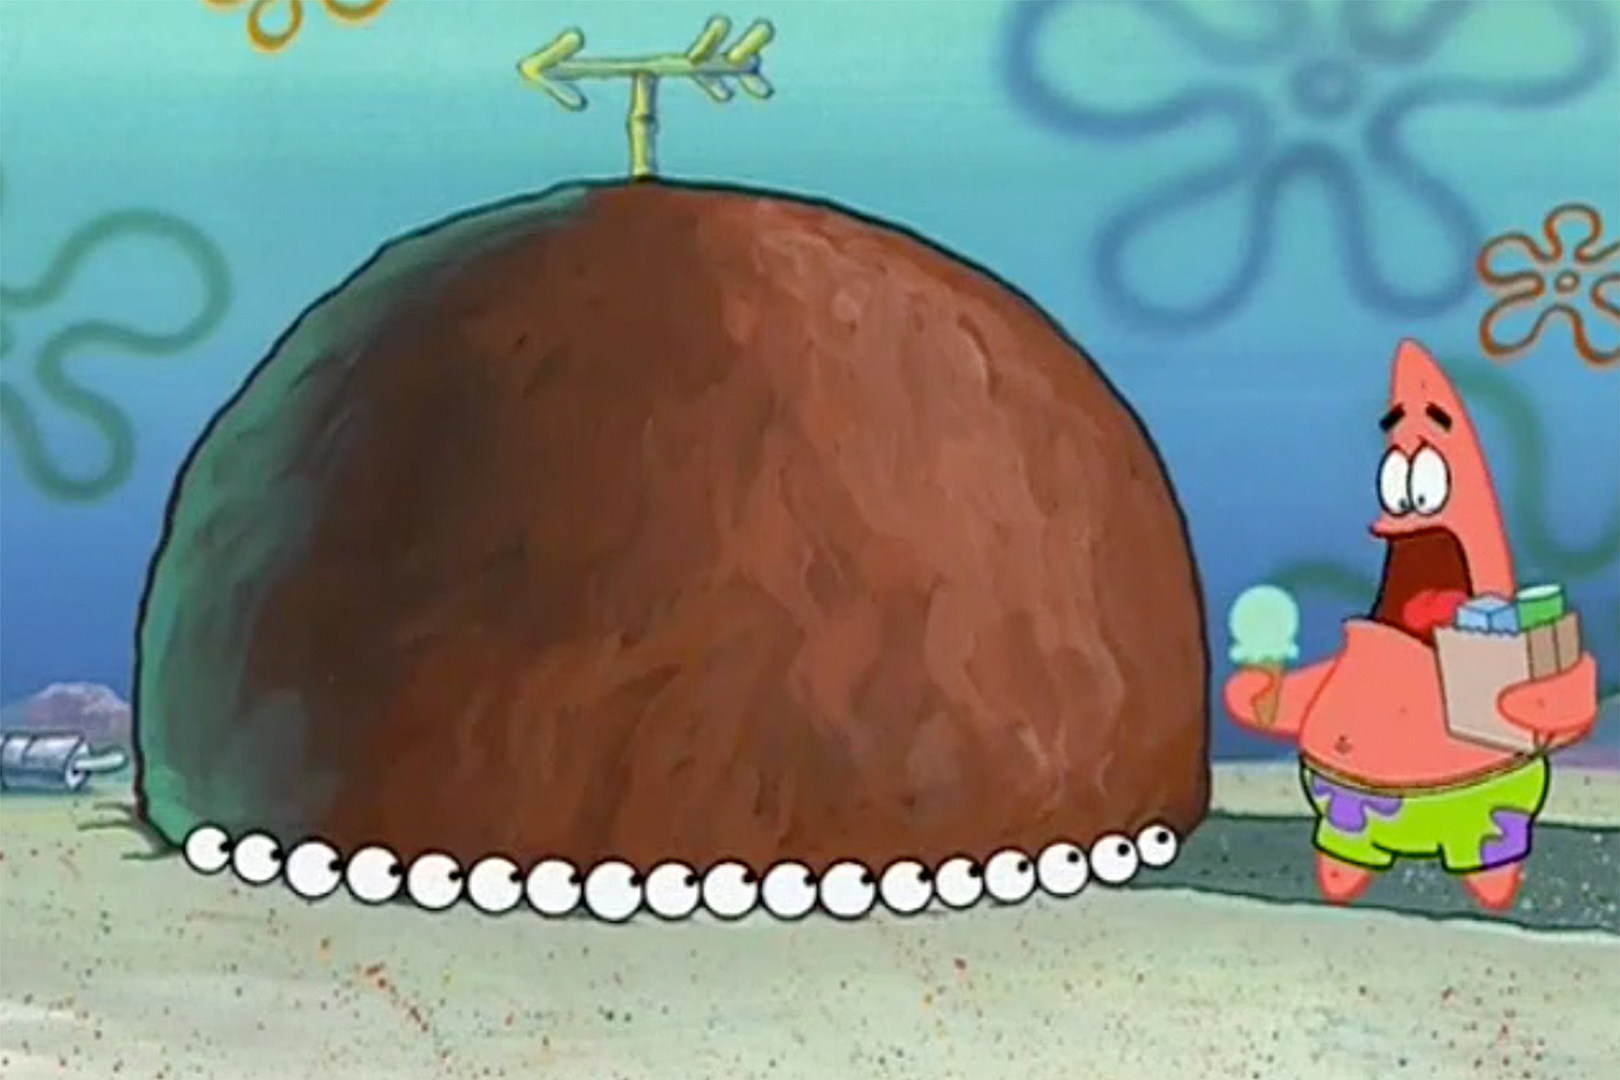 Remember When Pantera Were in a Spongebob Episode?